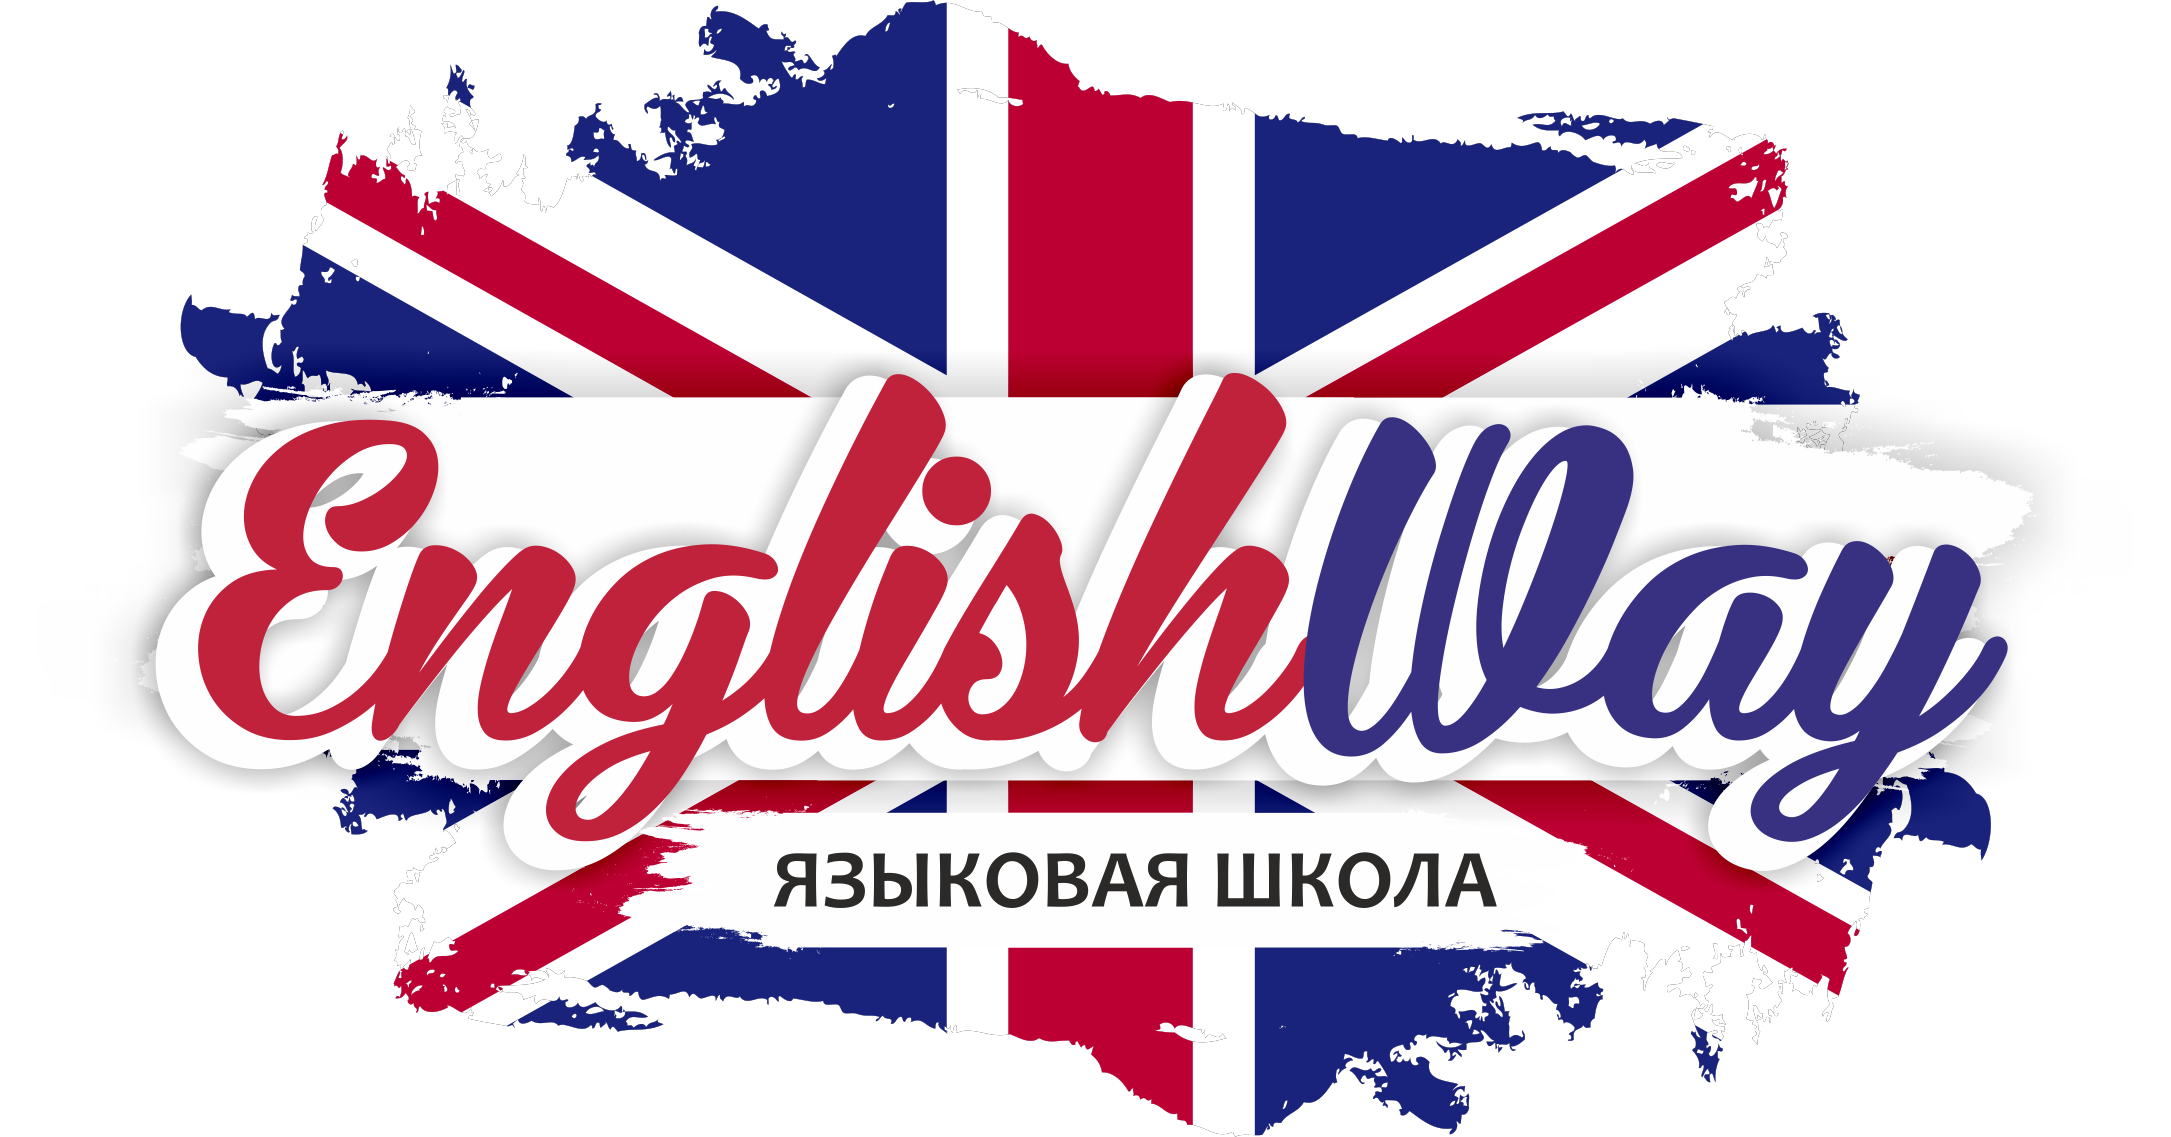 Языковая школа EnglishWay